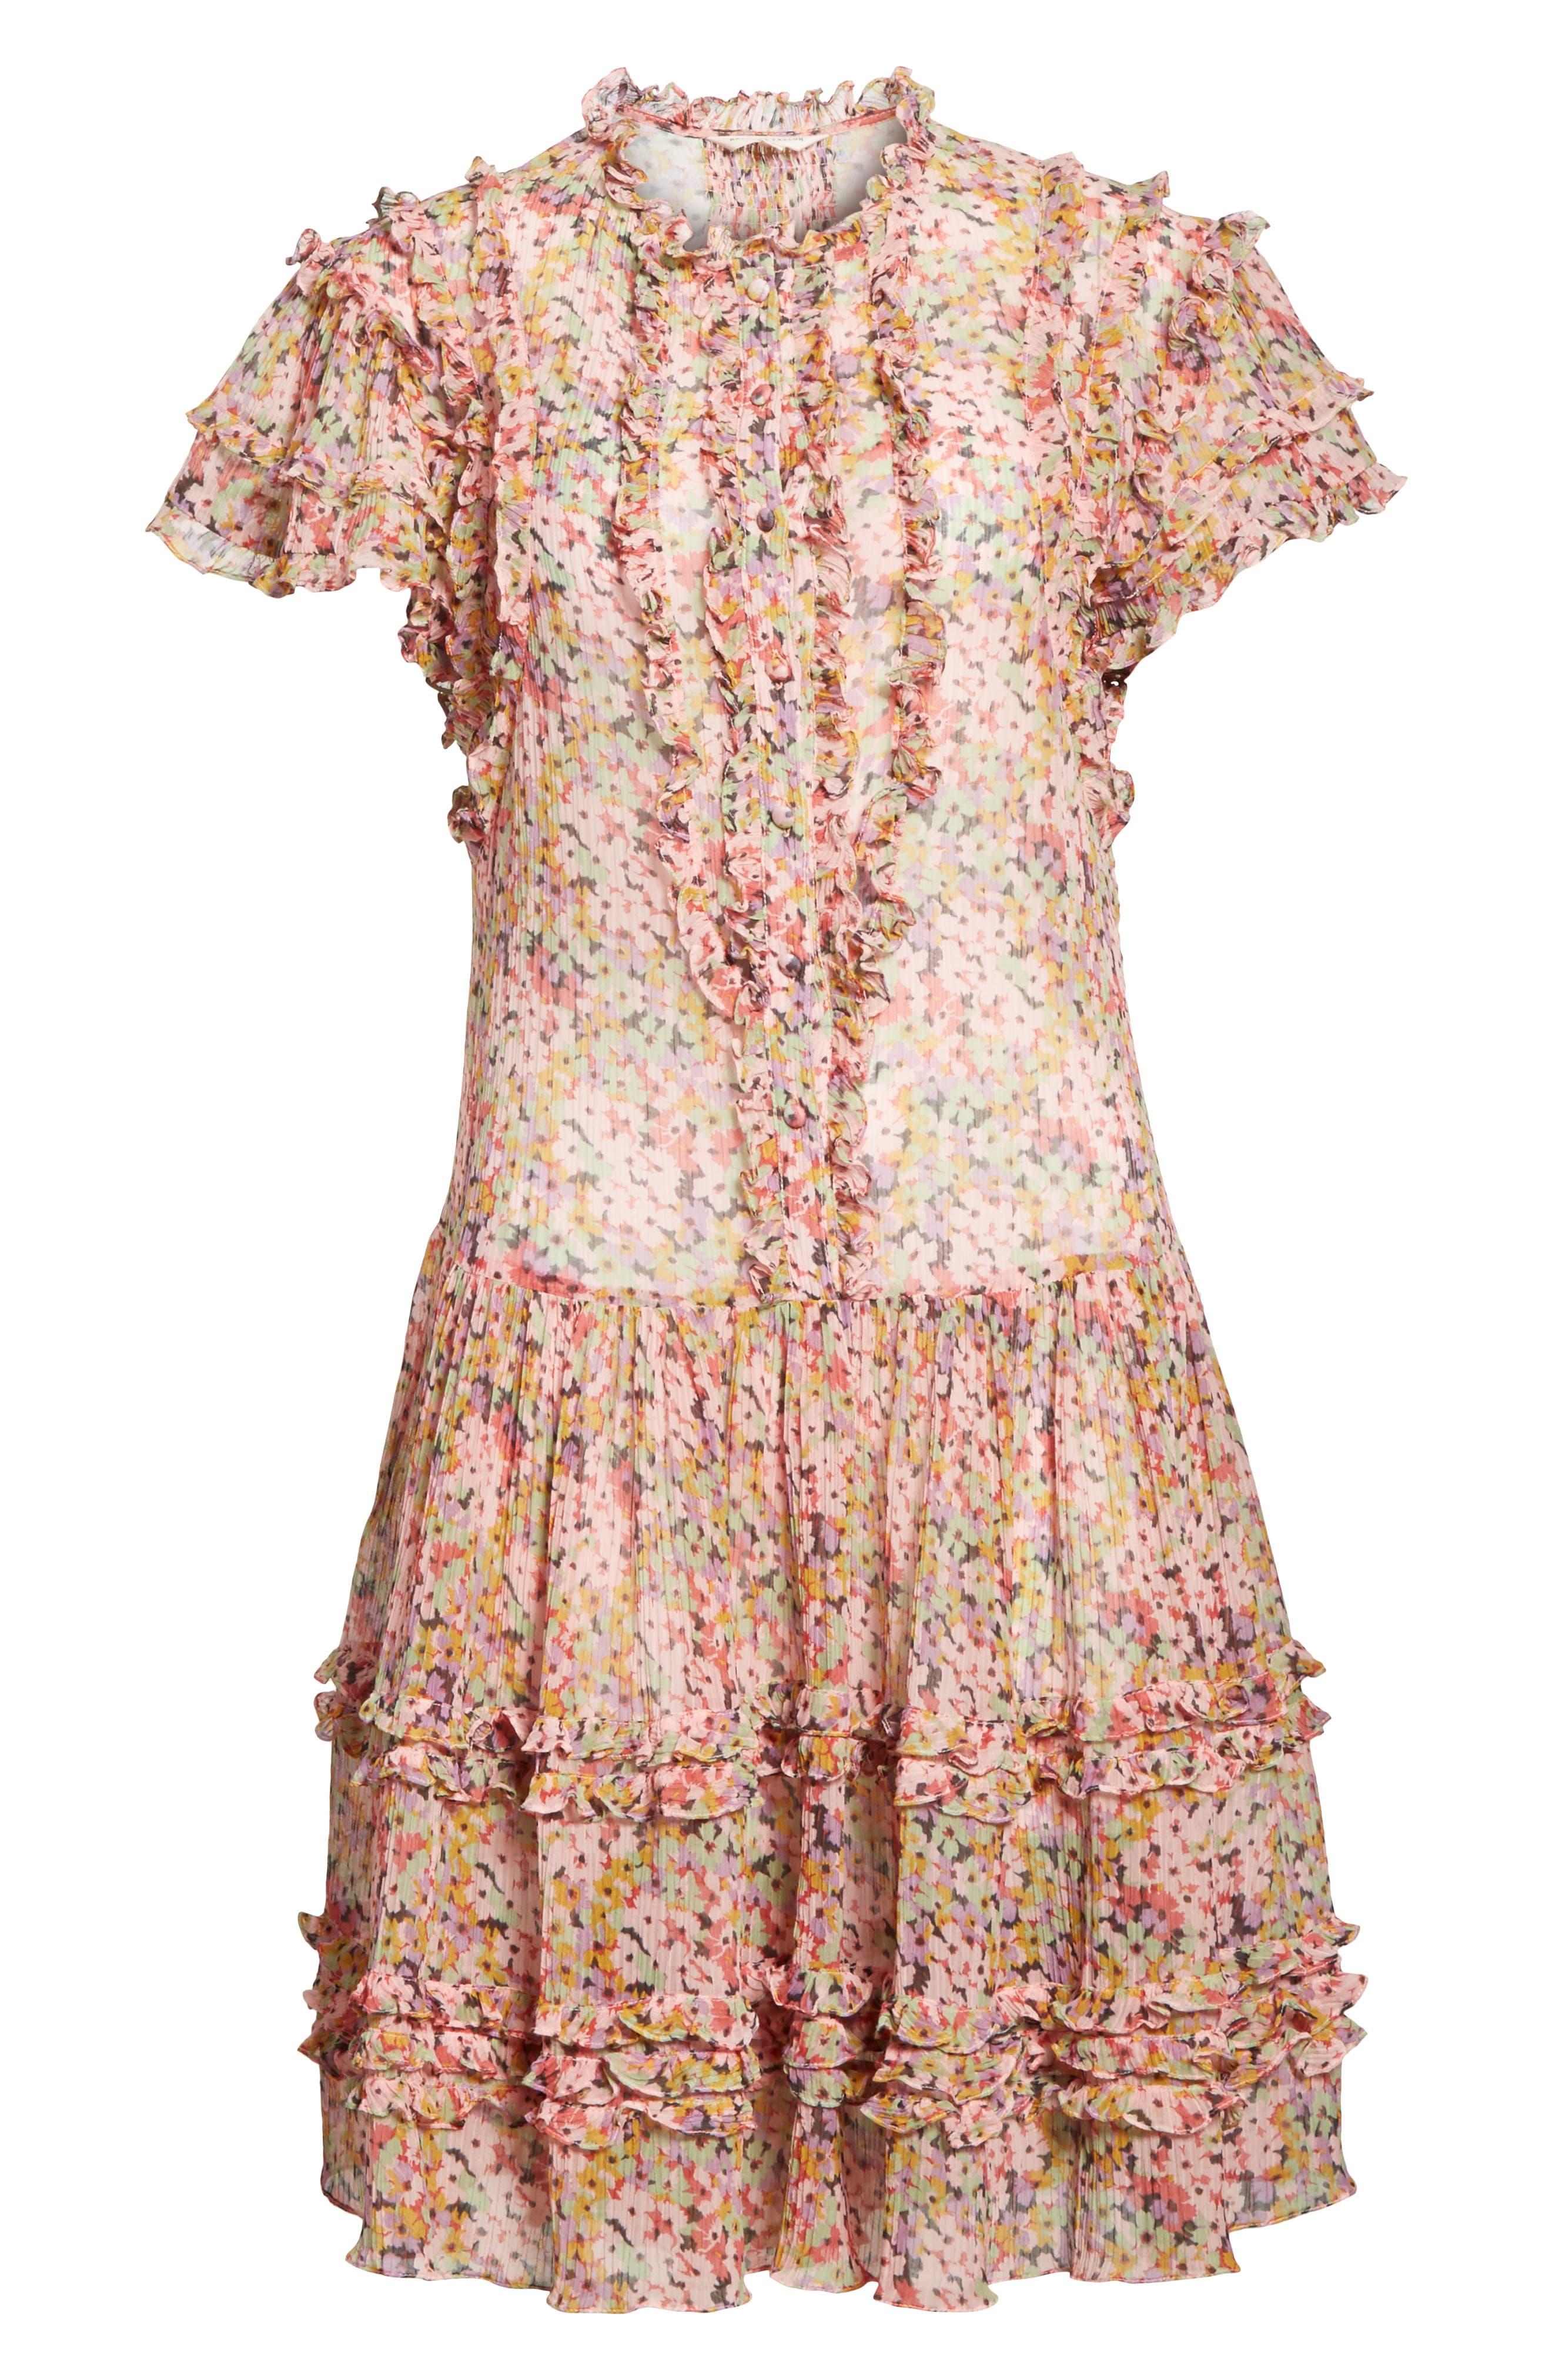 Margo Ruffled Floral Drop Waist Dress,                             Alternate thumbnail 6, color,                             686